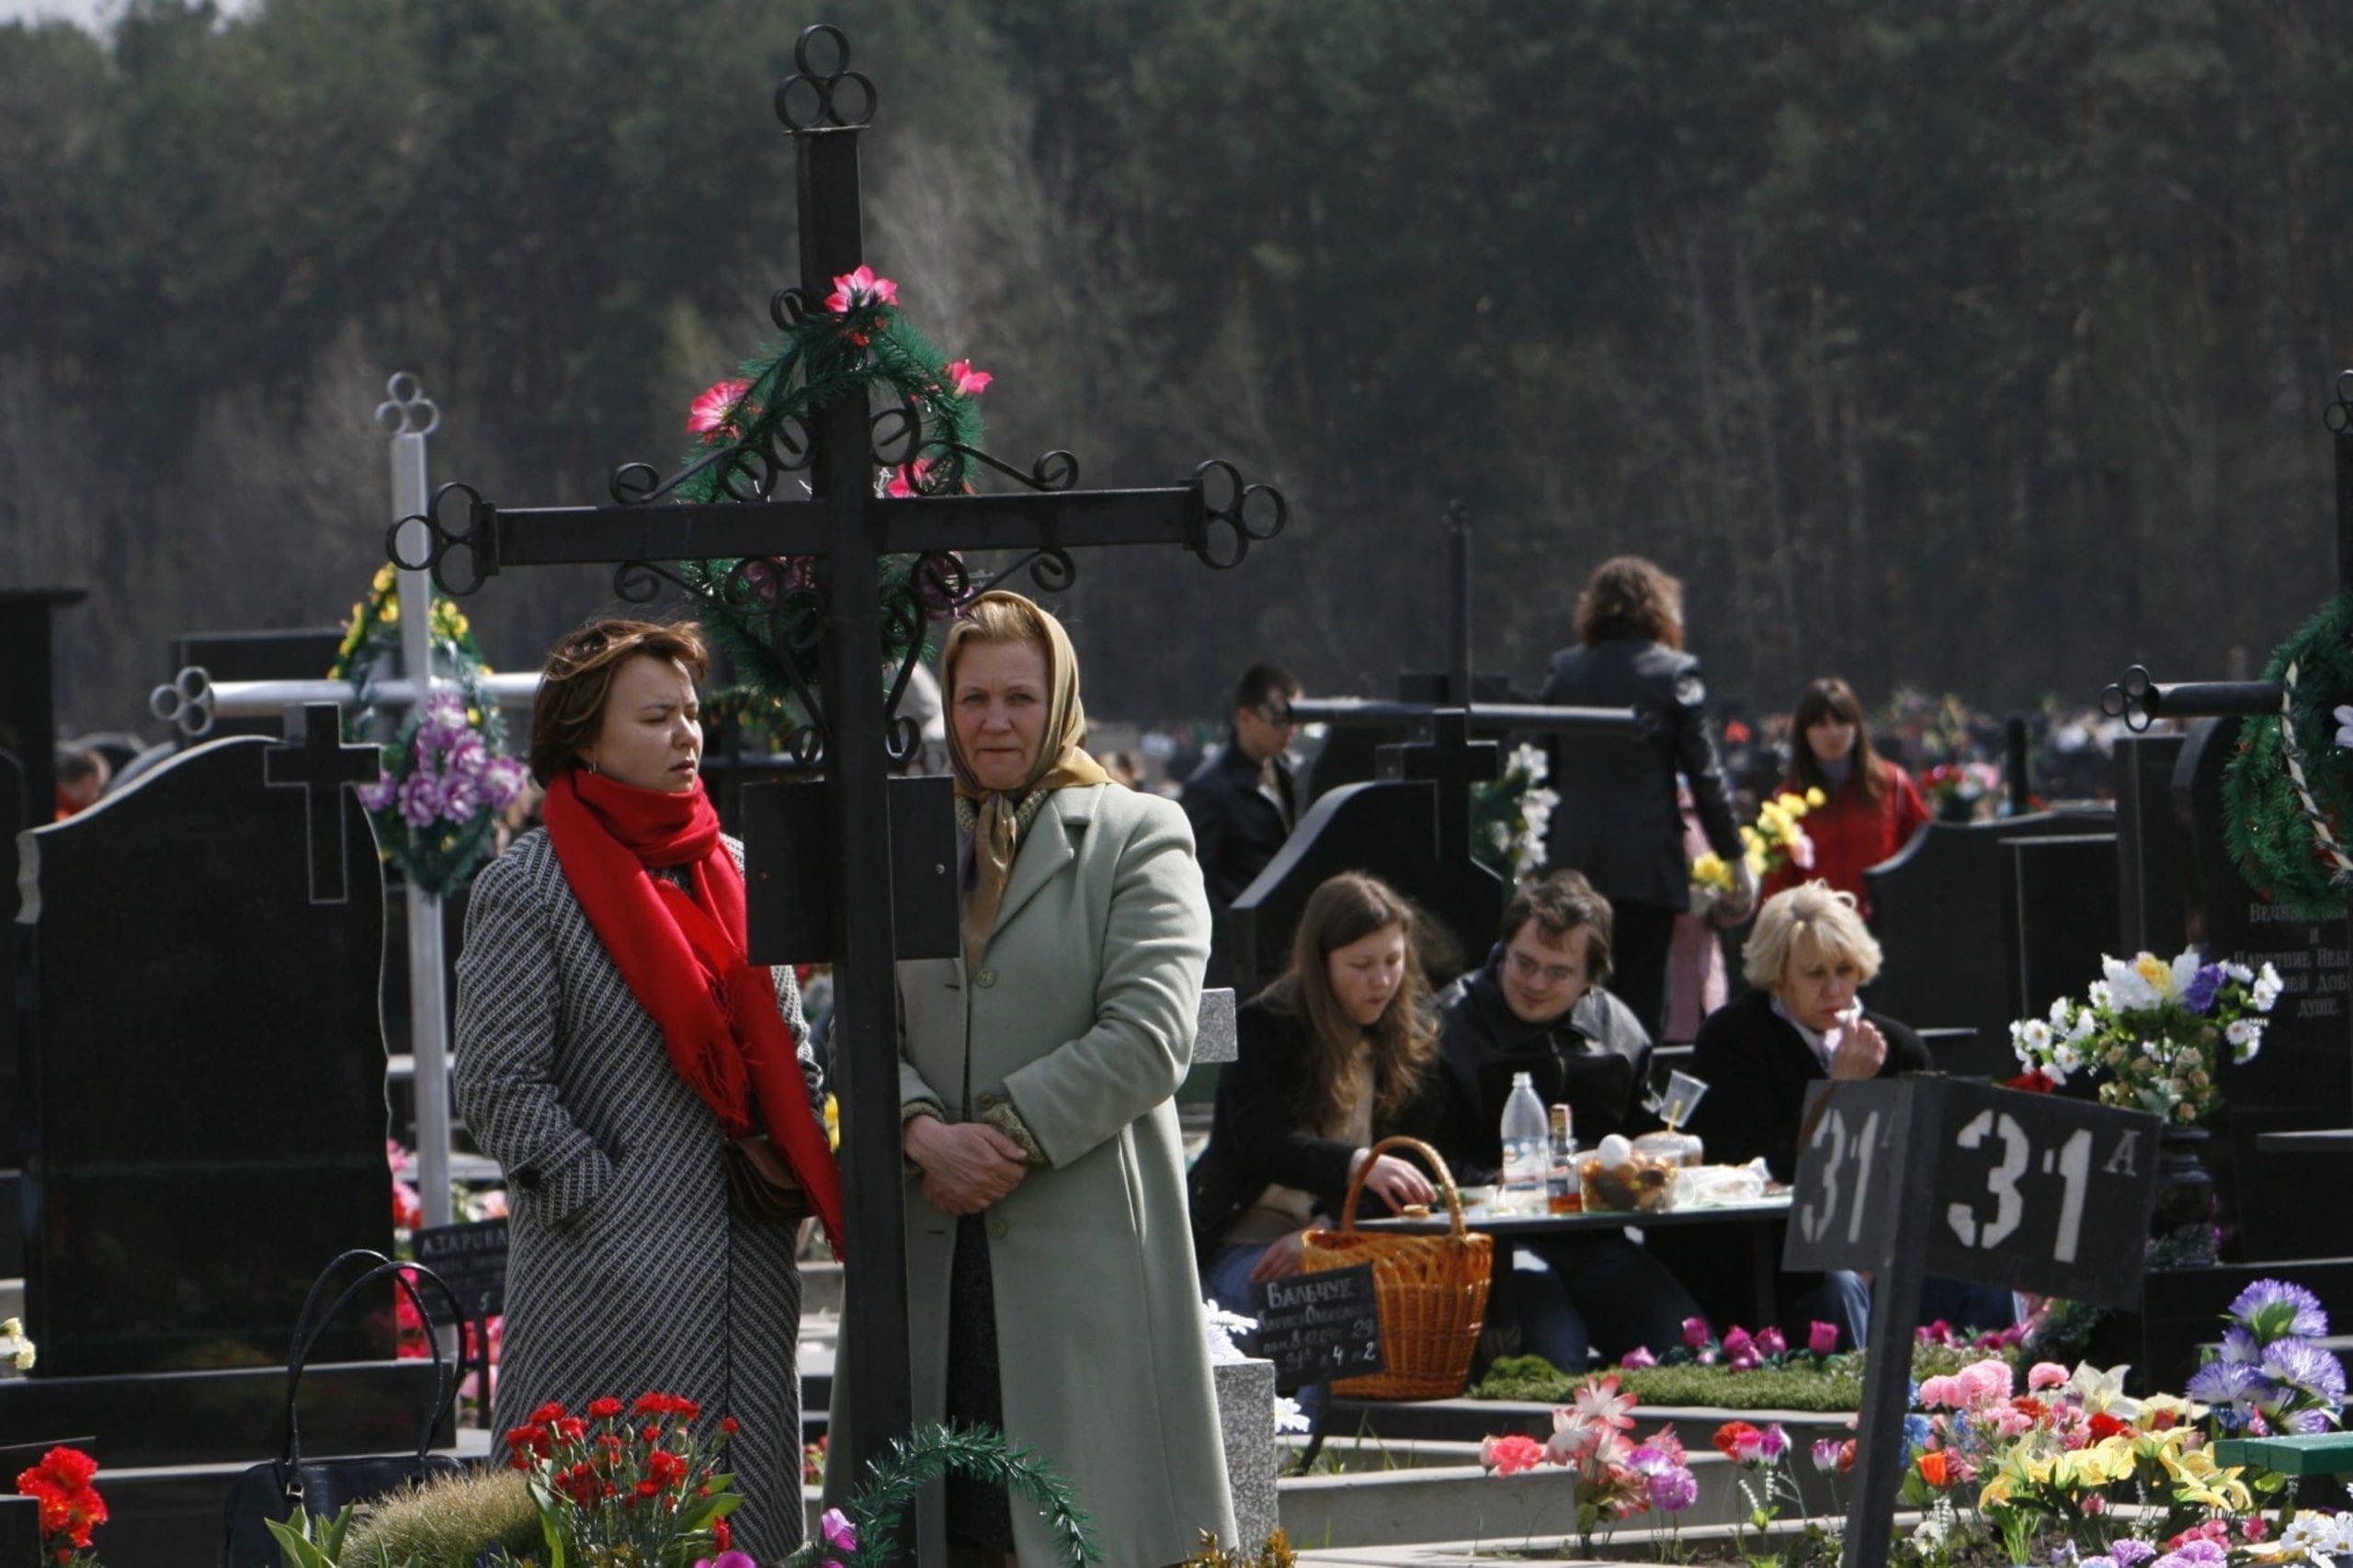 kostyantin chernichkin 04 scaled - <b>В Украине проходят Гробки, когда люди устраивают трапезы на кладбищах.</b> Объясняем, что это за традиция - Заборона